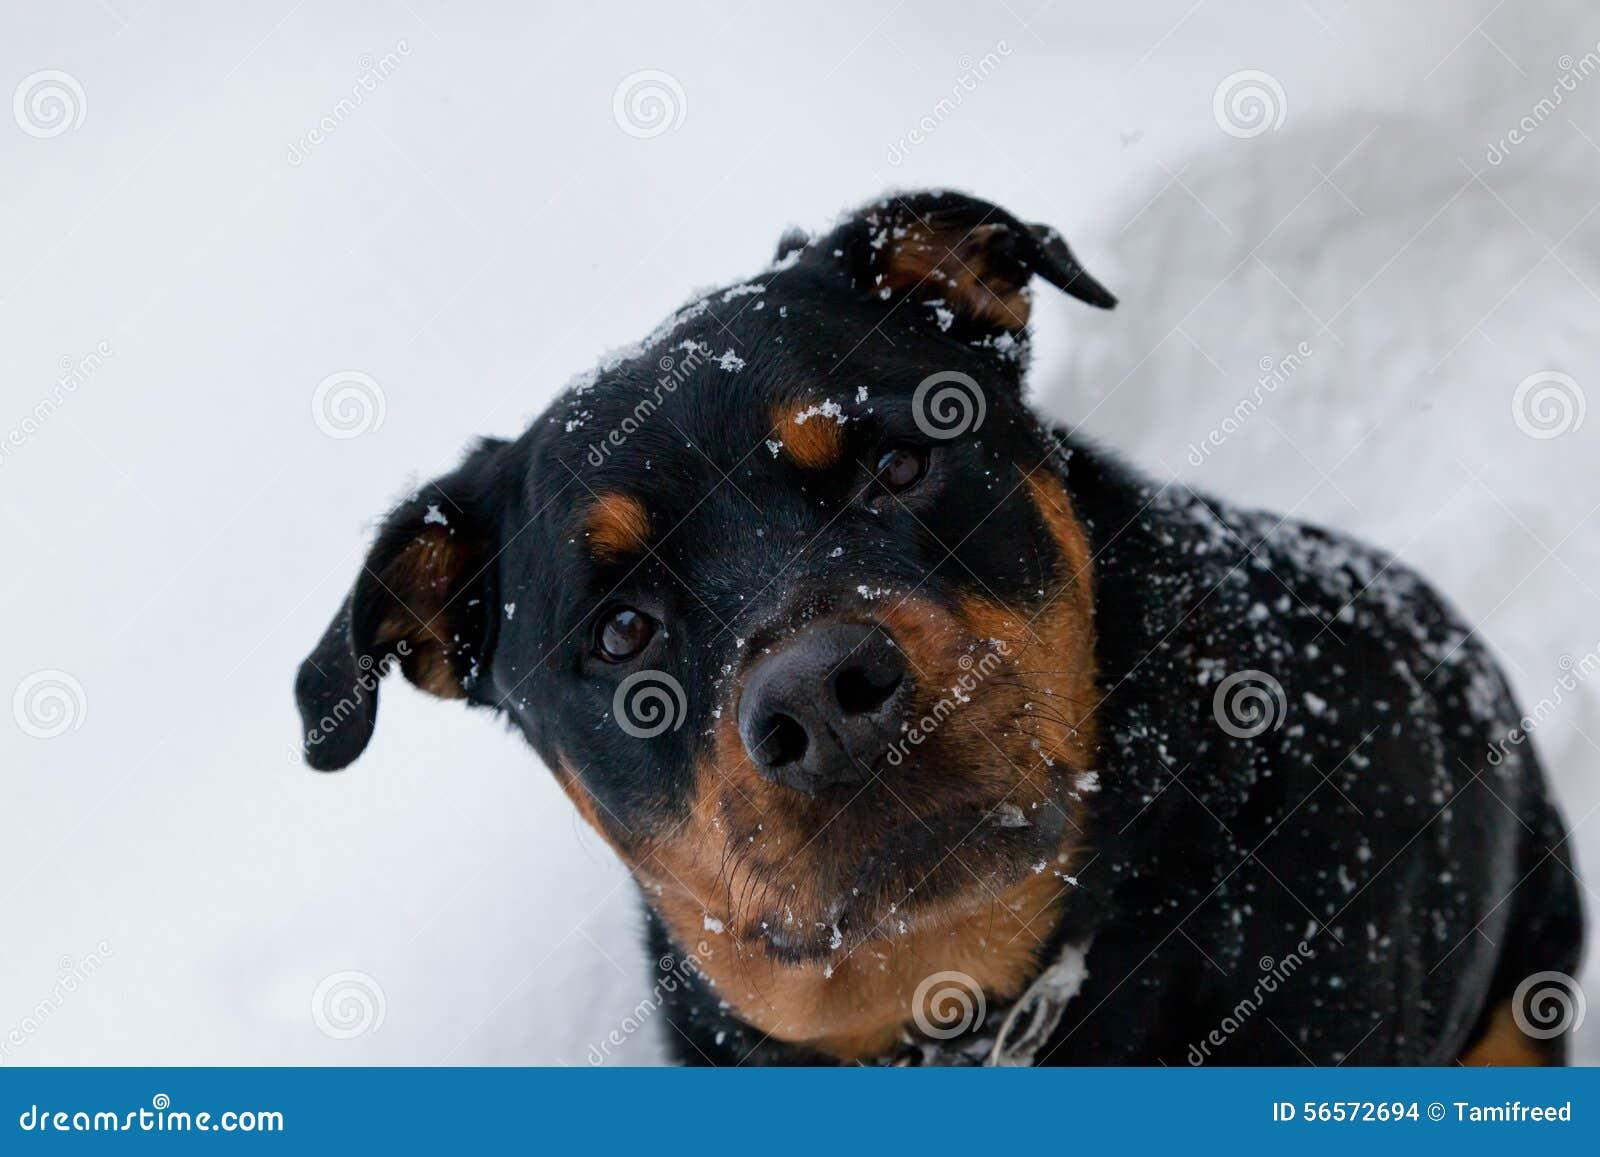 Download Σκυλί στο χιόνι στοκ εικόνες. εικόνα από κοιτάξτε, χαριτωμένος - 56572694